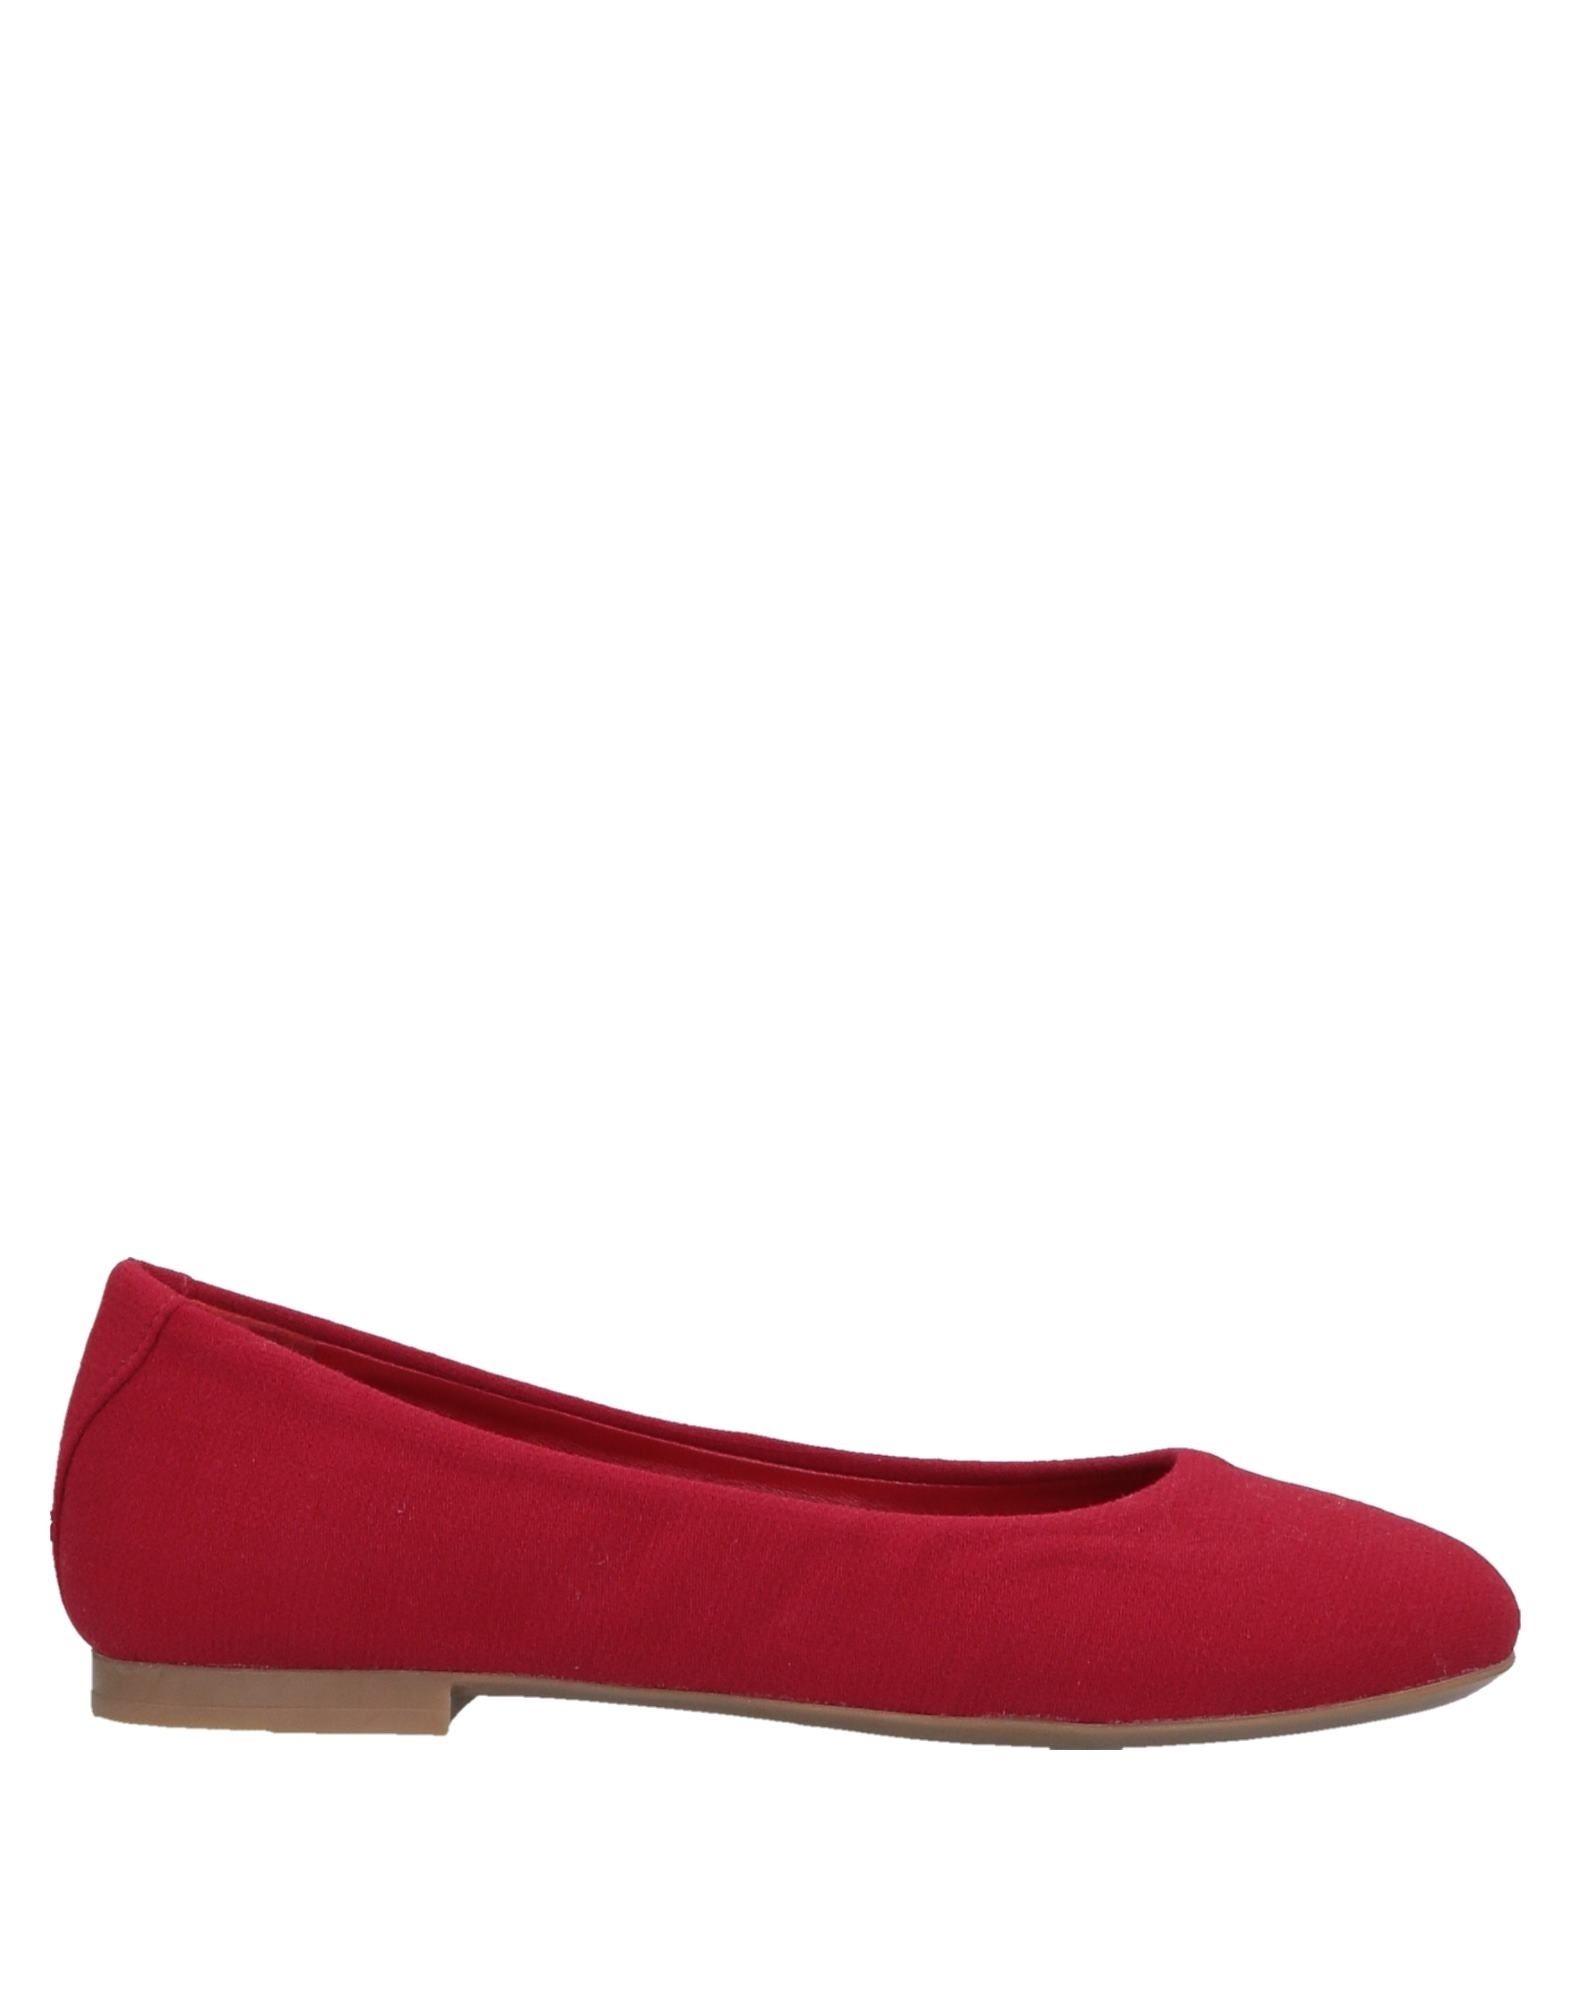 DOLCE & GABBANA | DOLCE & GABBANA Ballet Flats 11233176 | Goxip